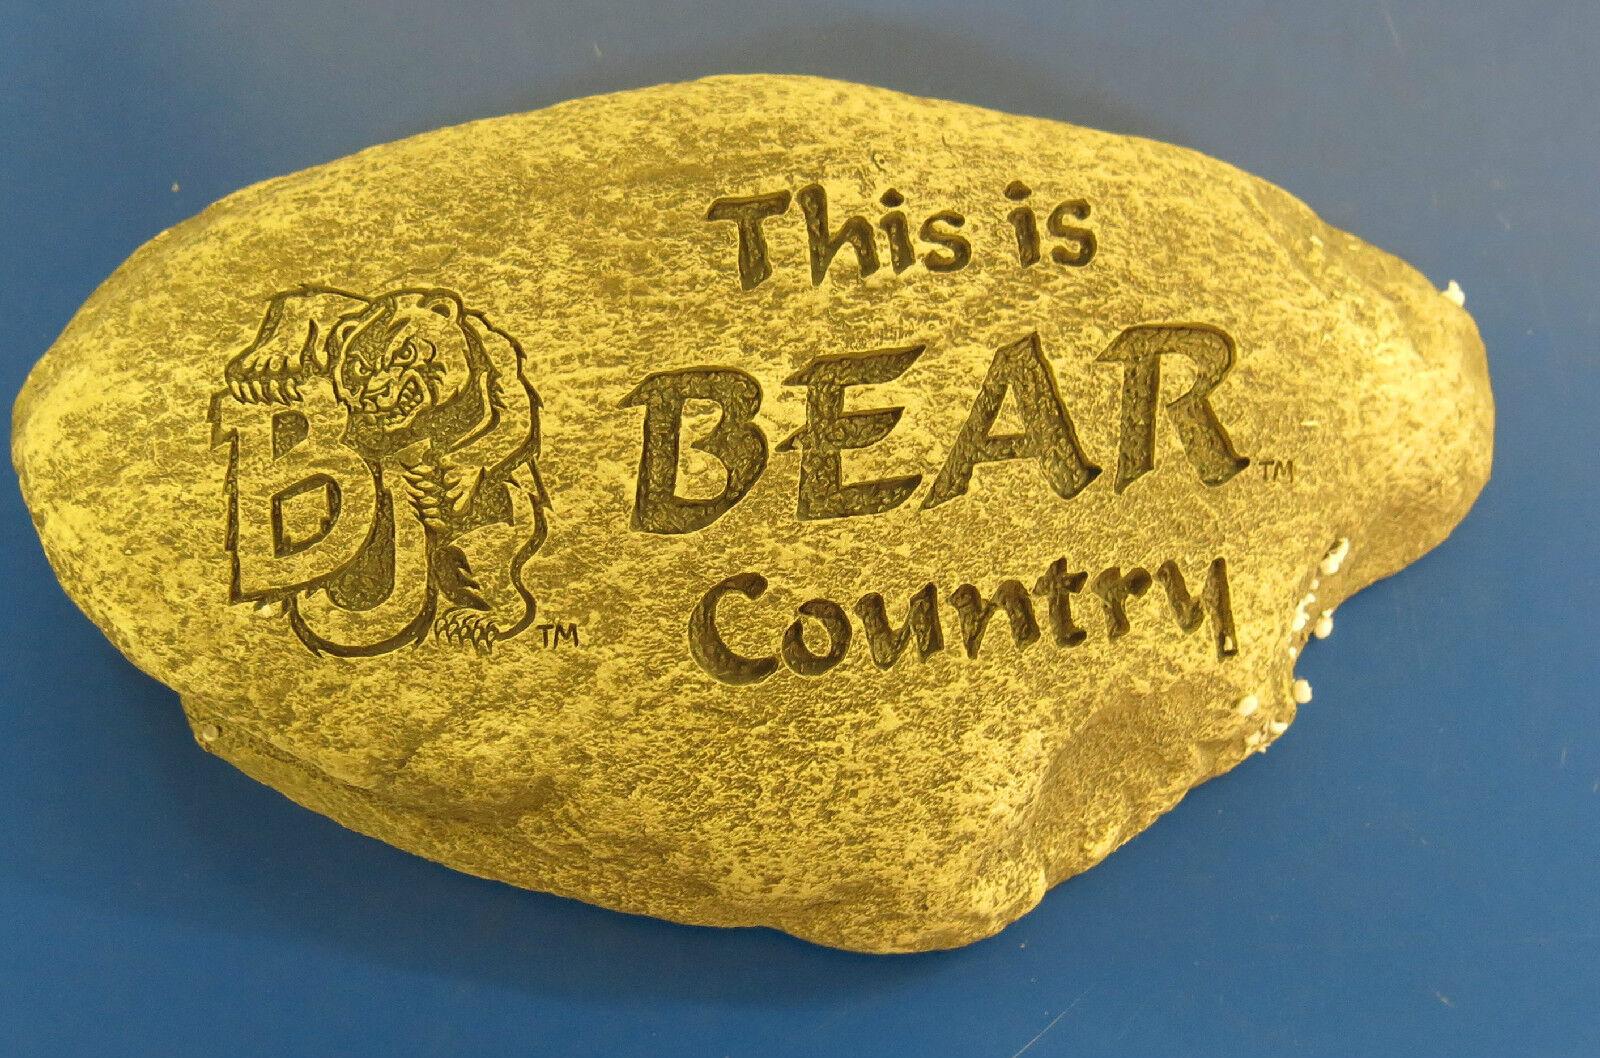 Stoneworx Baylor Garden Stone For Sale Online Ebay